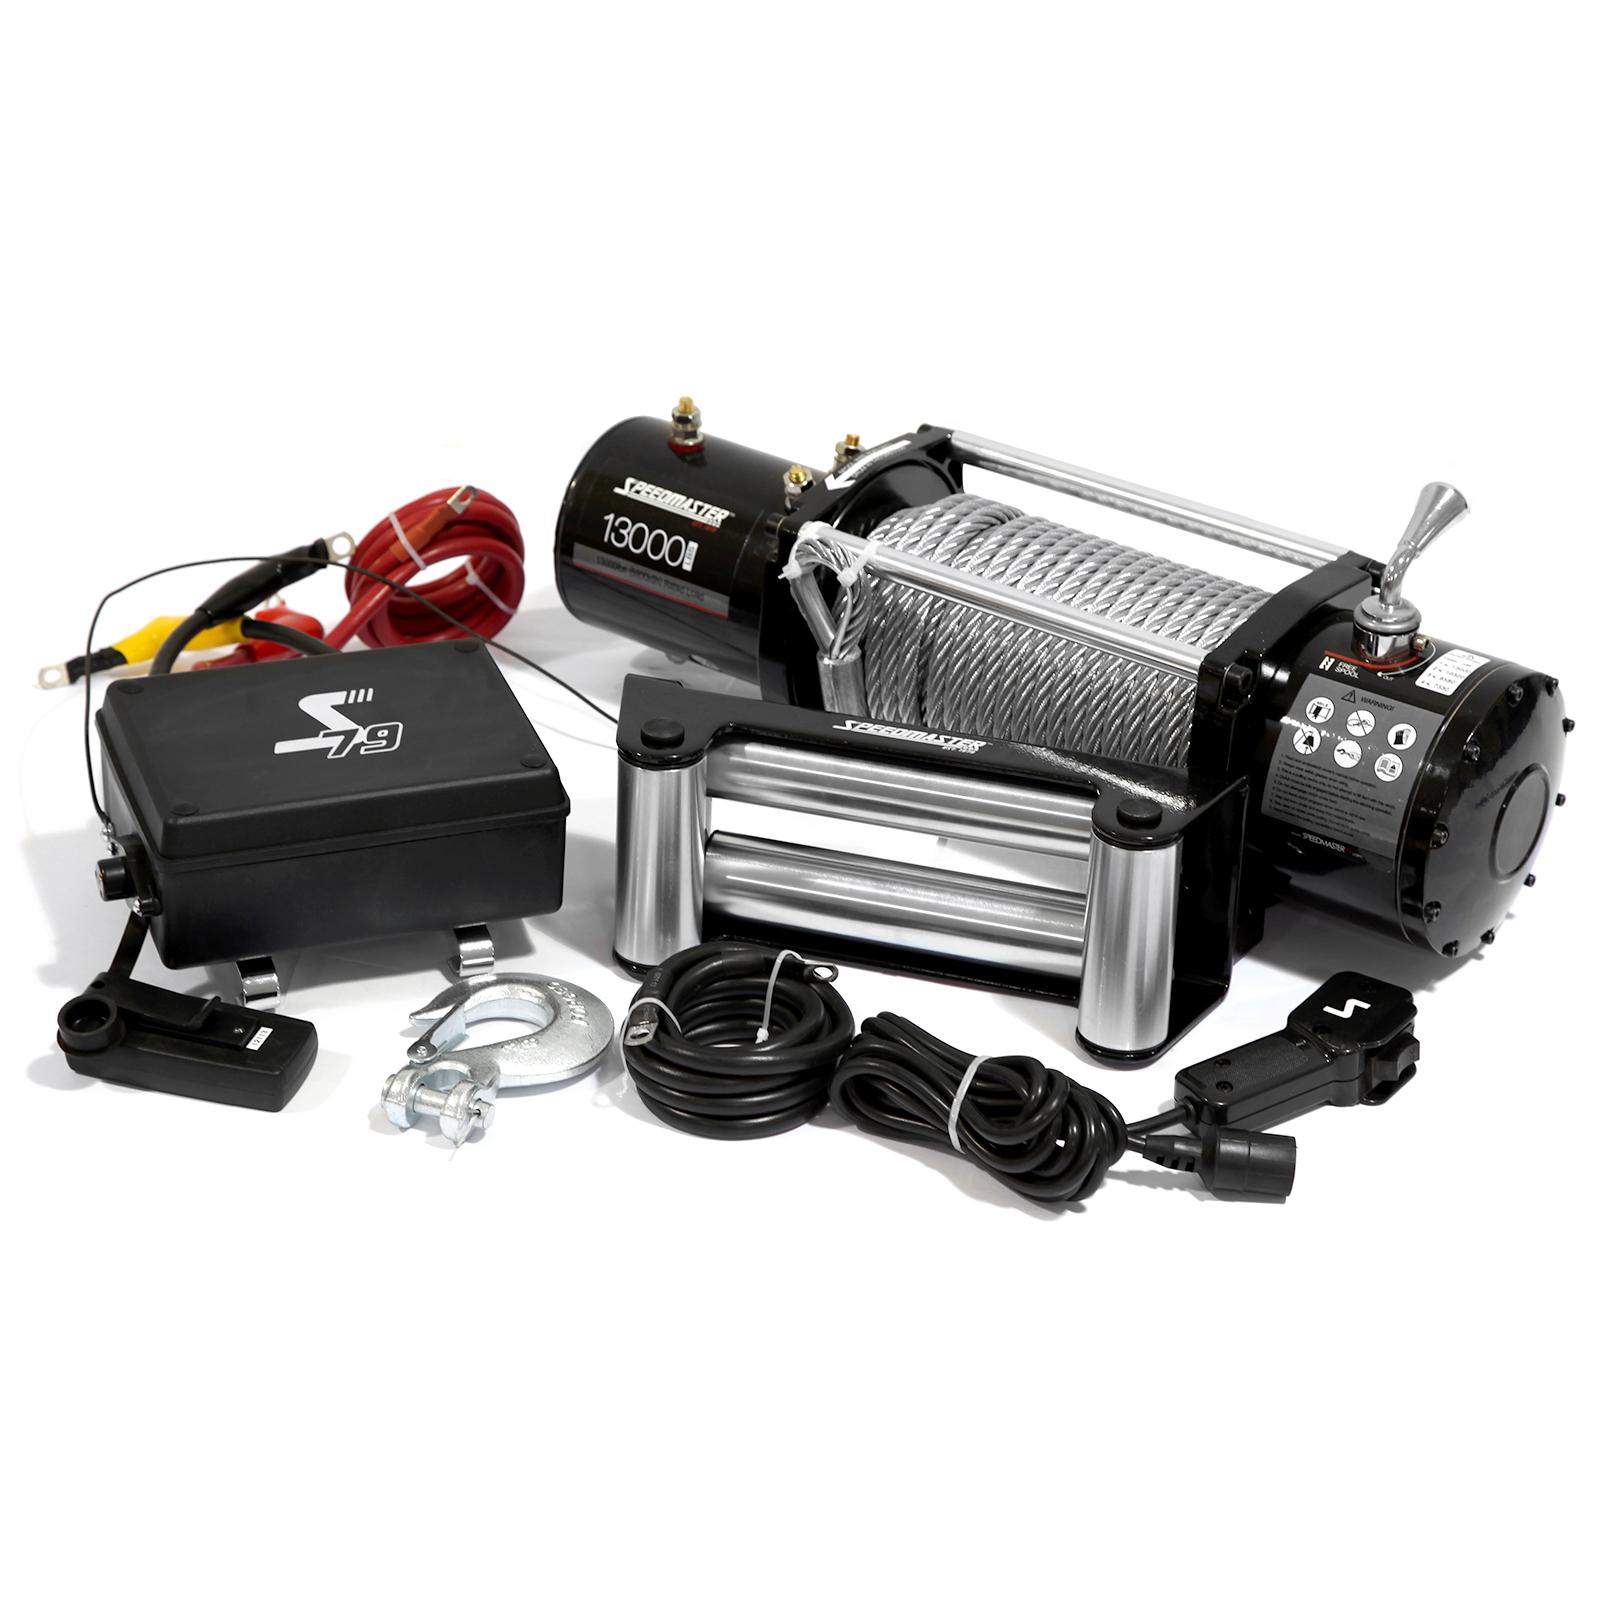 Speedmaster 13000lbs / 5900kgs 12V Electric 4wd Winch Kit w/ Wireless Remote